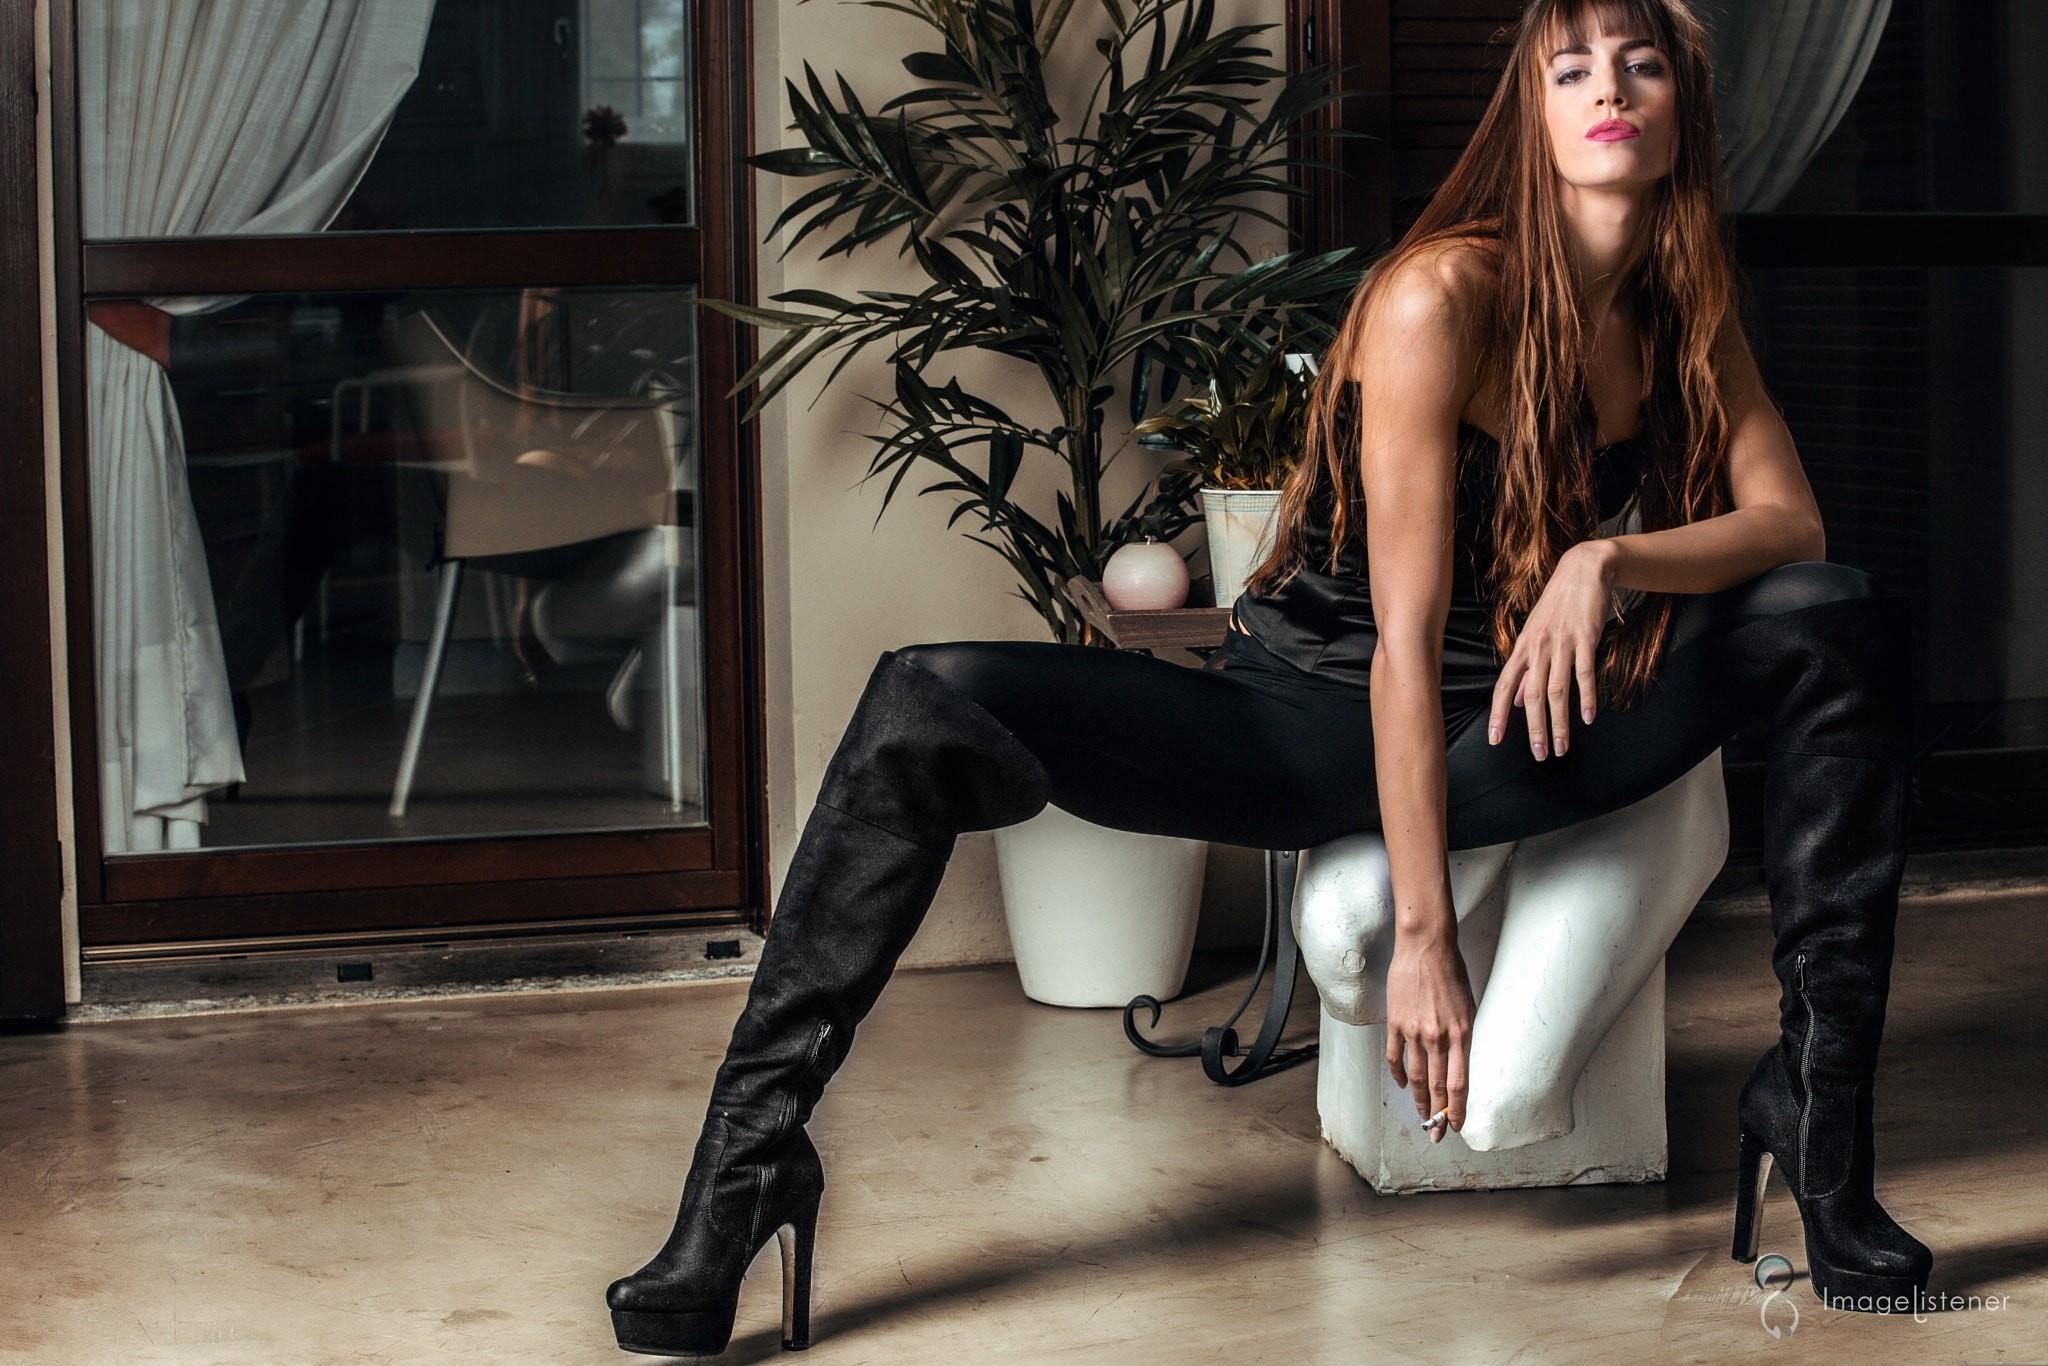 People 2048x1366 Alice Brivio Paolo Carlo Lunni women model brunette boots smoke long hair